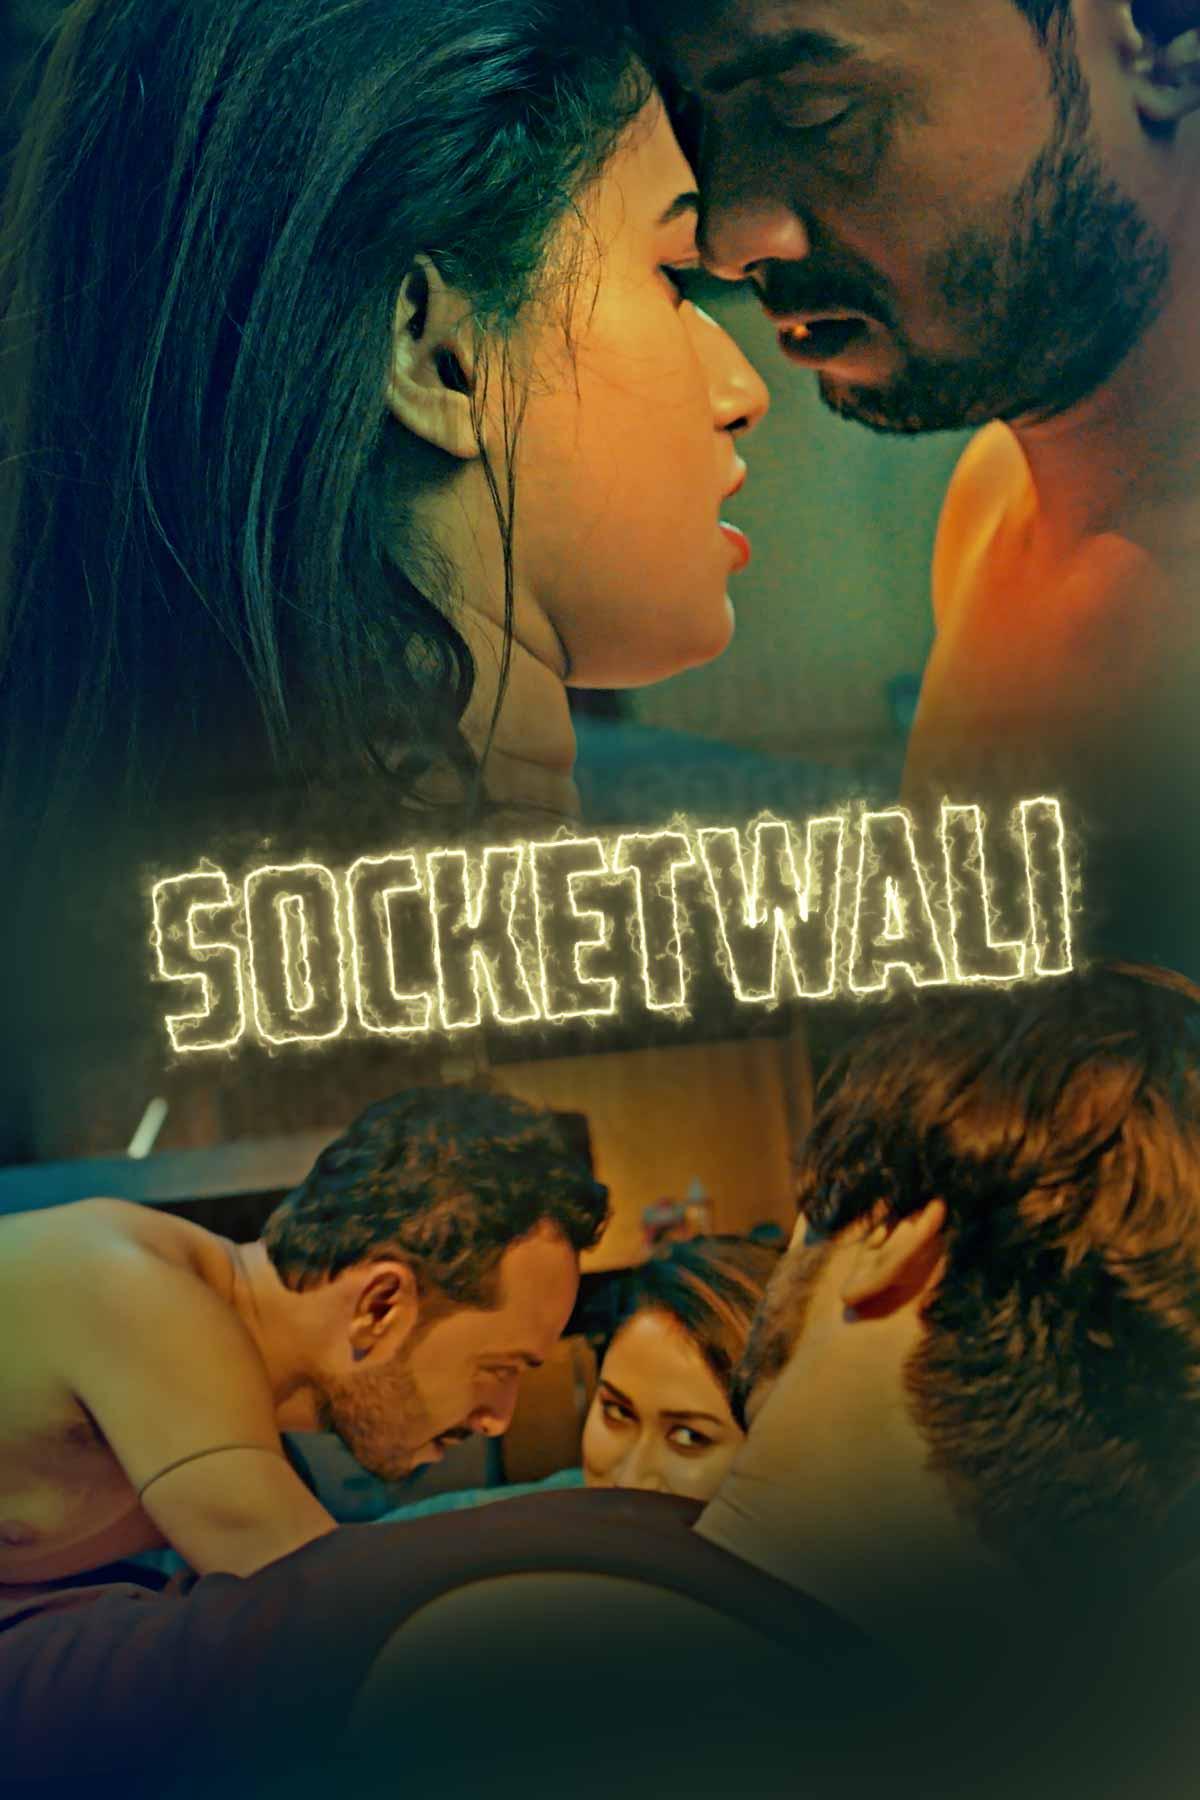 SocketWali 2021 S01 Hindi Complete Kooku App Web Series 720p HDRip Download